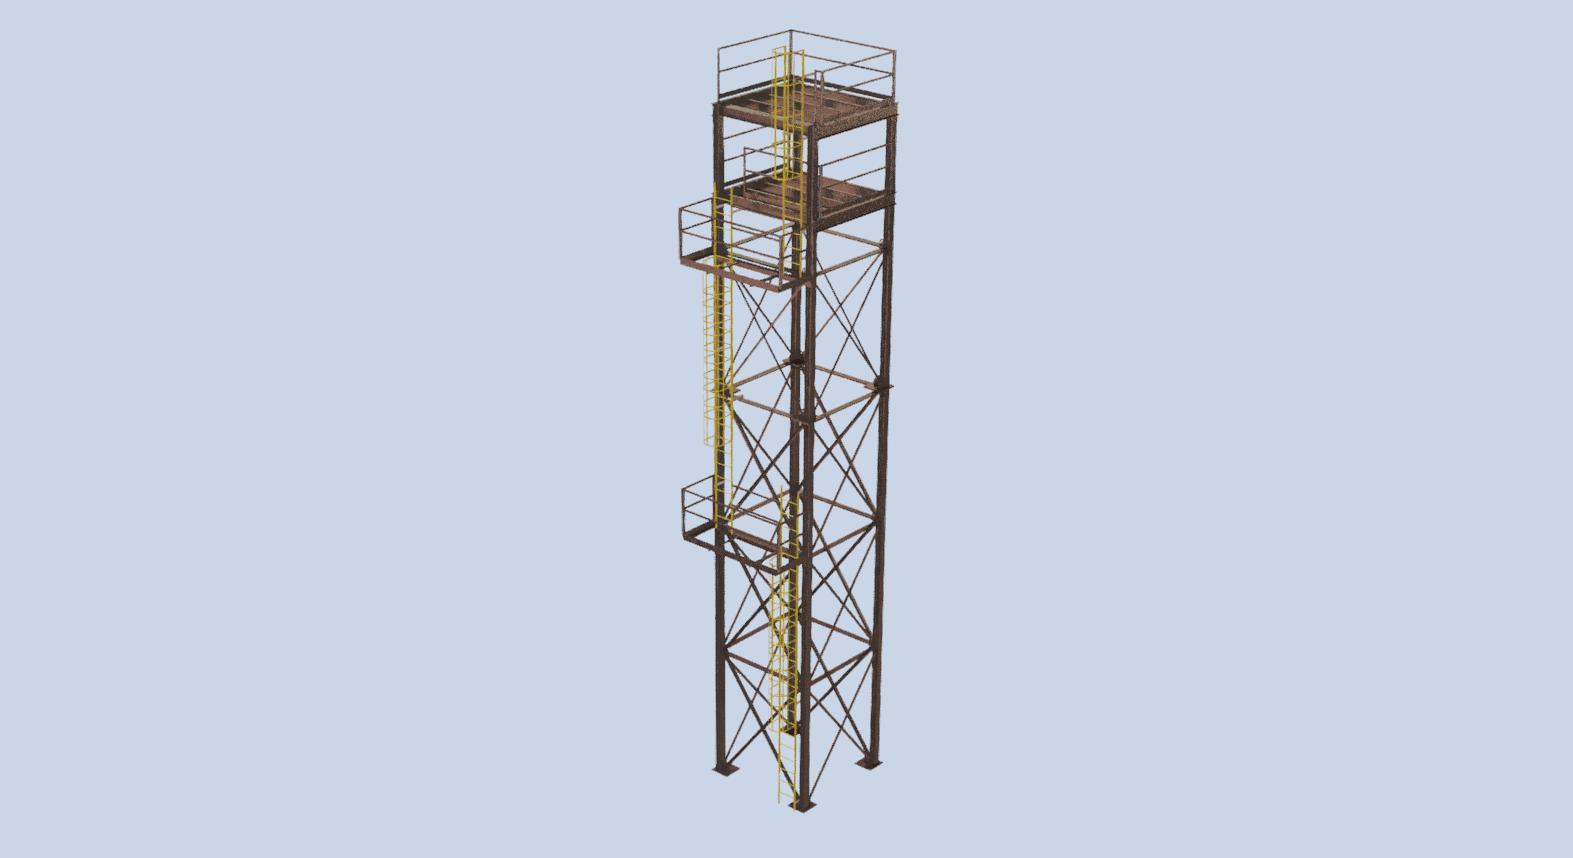 https://0201.nccdn.net/1_2/000/000/0df/c7c/tower-at-building--002-.jpg